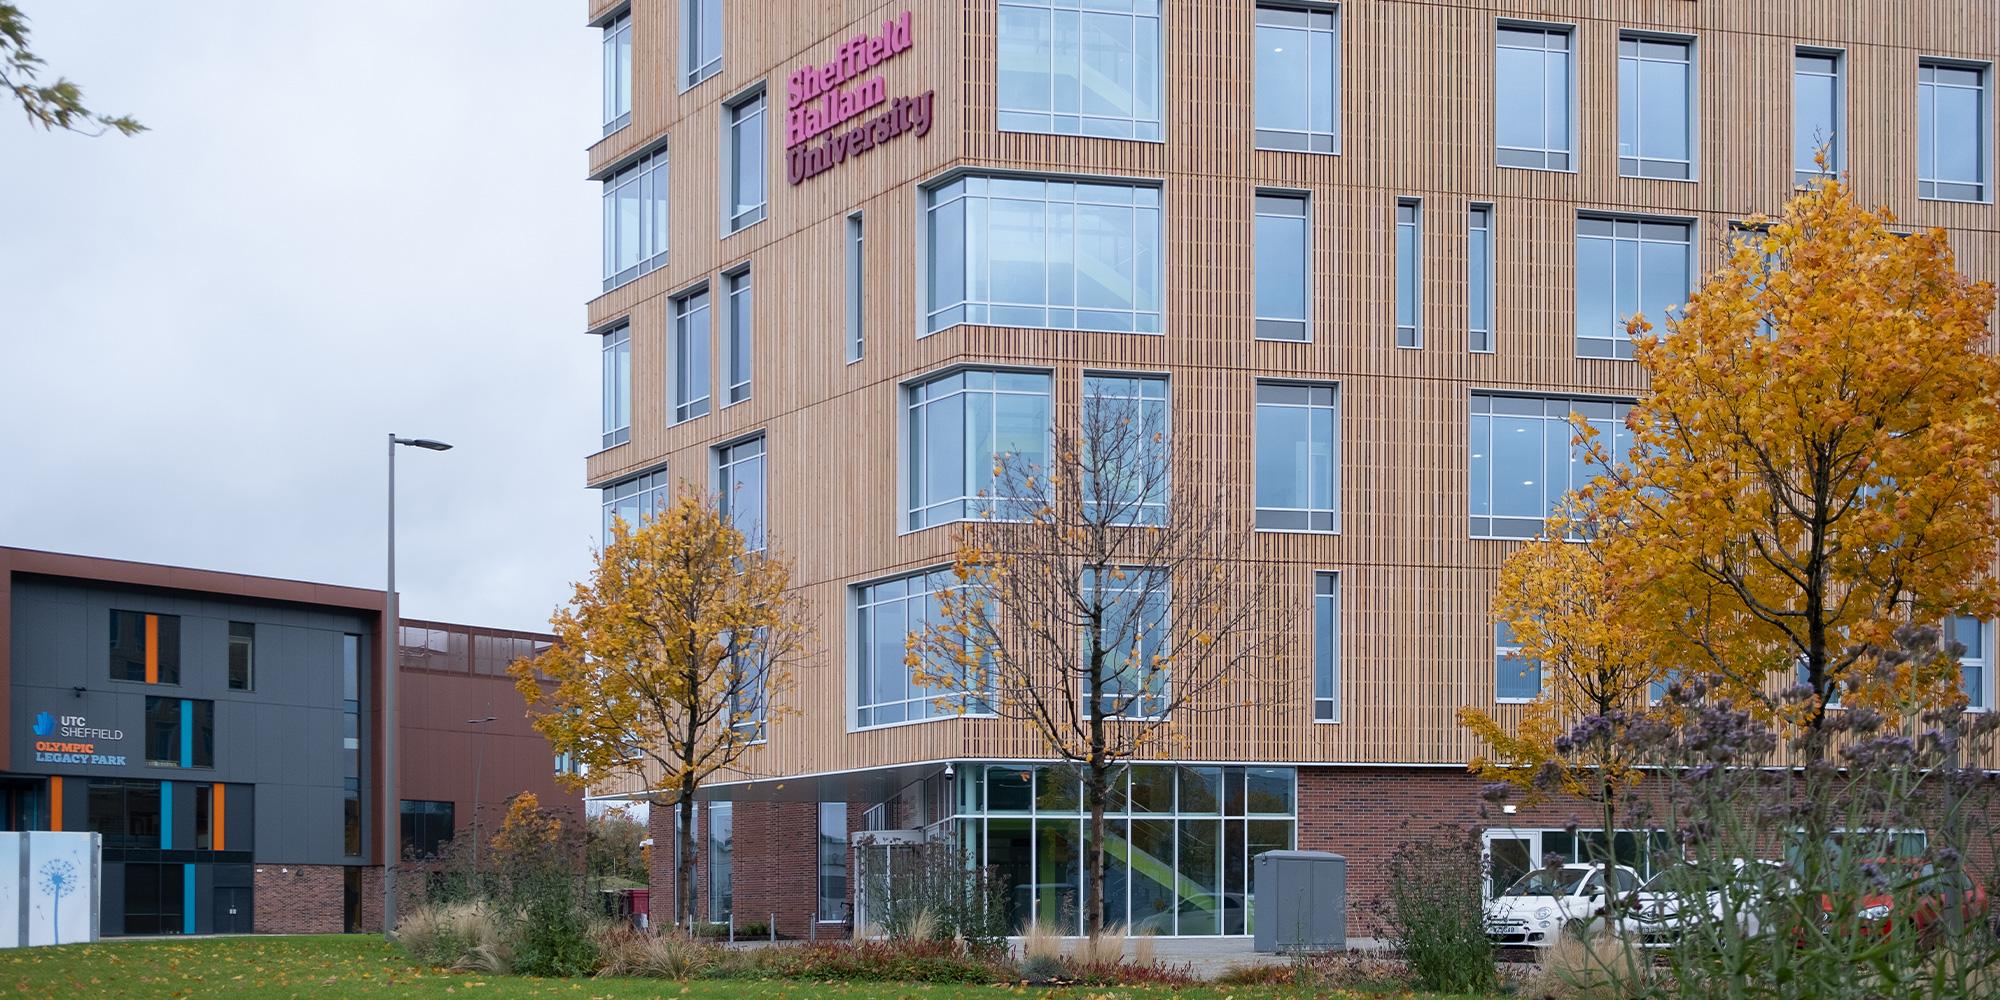 Sheffield Hallam University Case Studies Featured Image